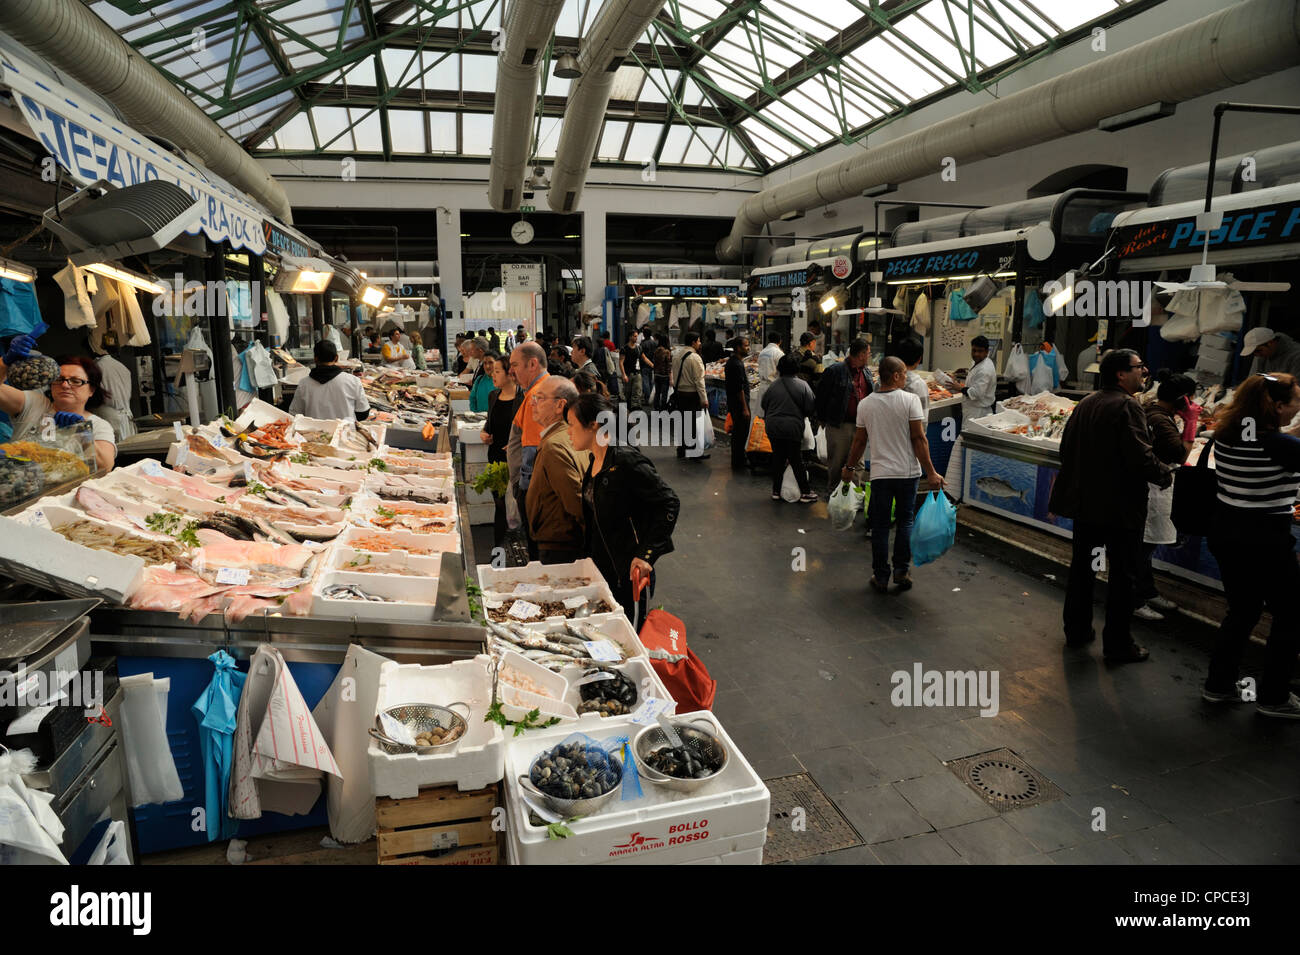 italy, rome, piazza vittorio, market - Stock Image